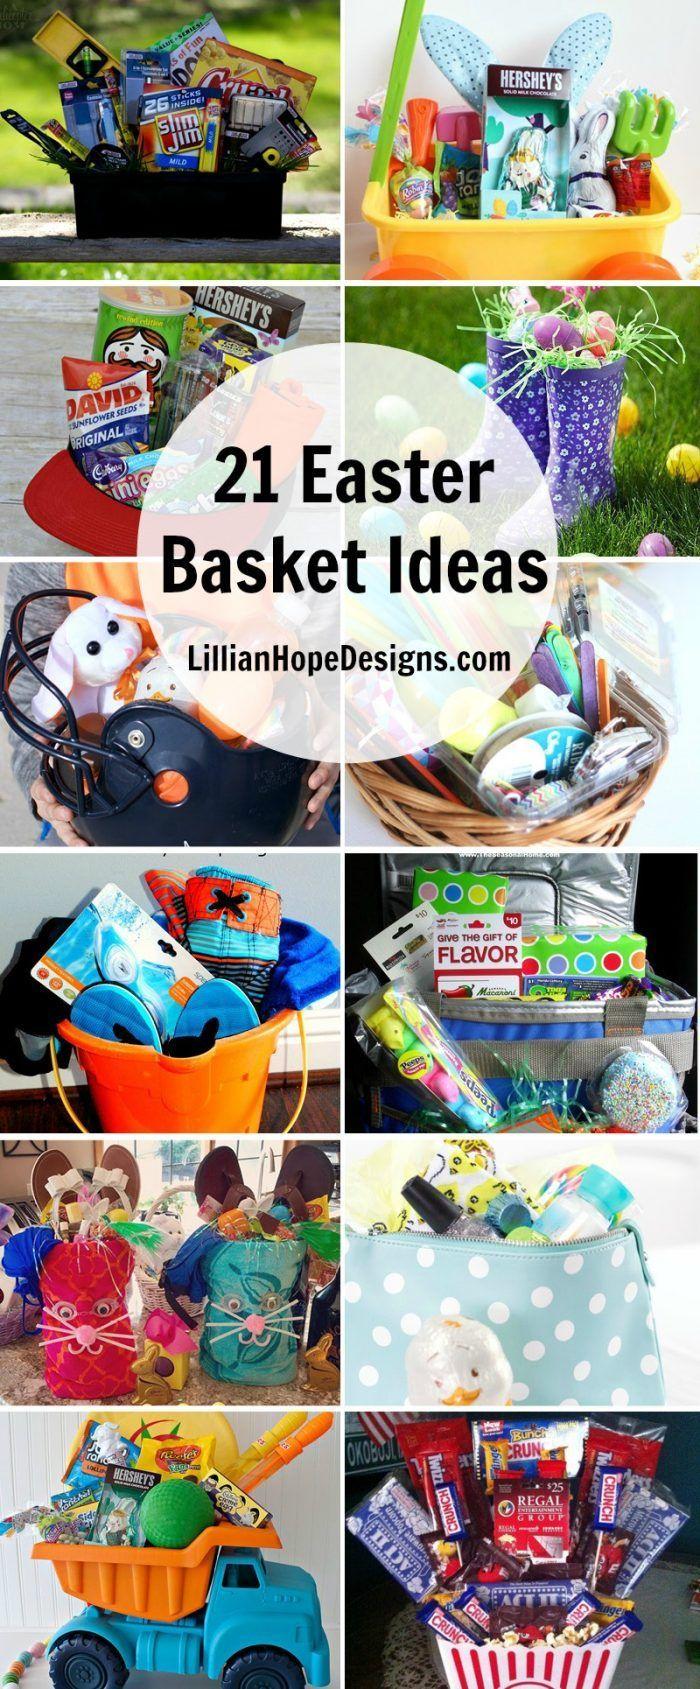 unique easter basket ideas for tweens  einzigartige osterkorbideen für tweens unique easter basket ideas for tweens  Paper easter basket ideas easter basket ideas Ba...